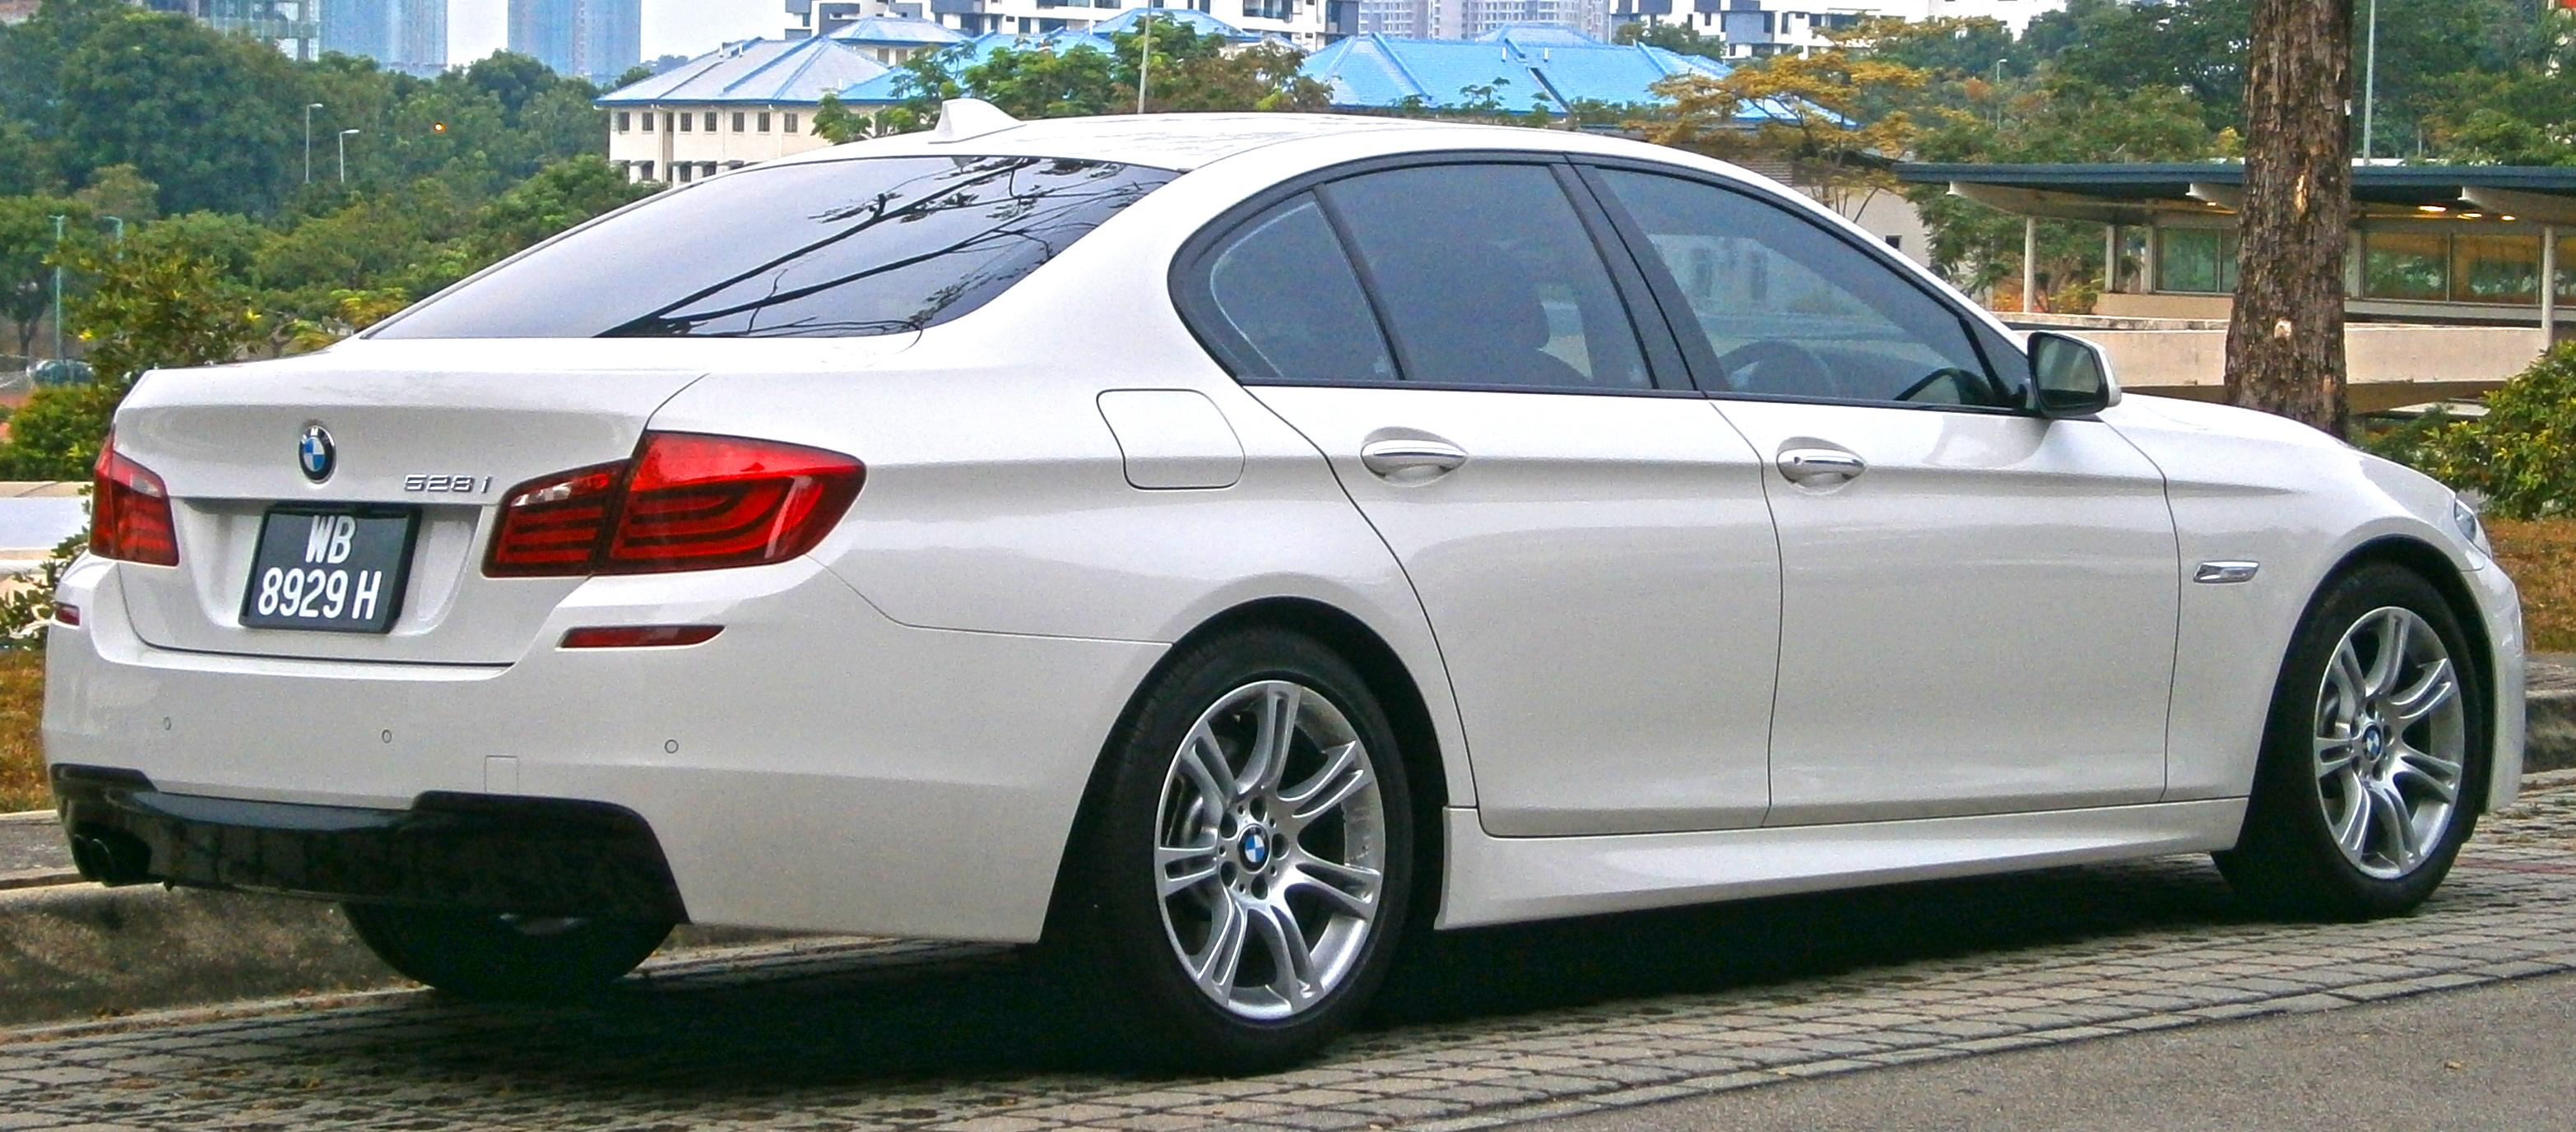 File:2015 BMW 528i (5 Series, F10) M Sport 4-door sedan